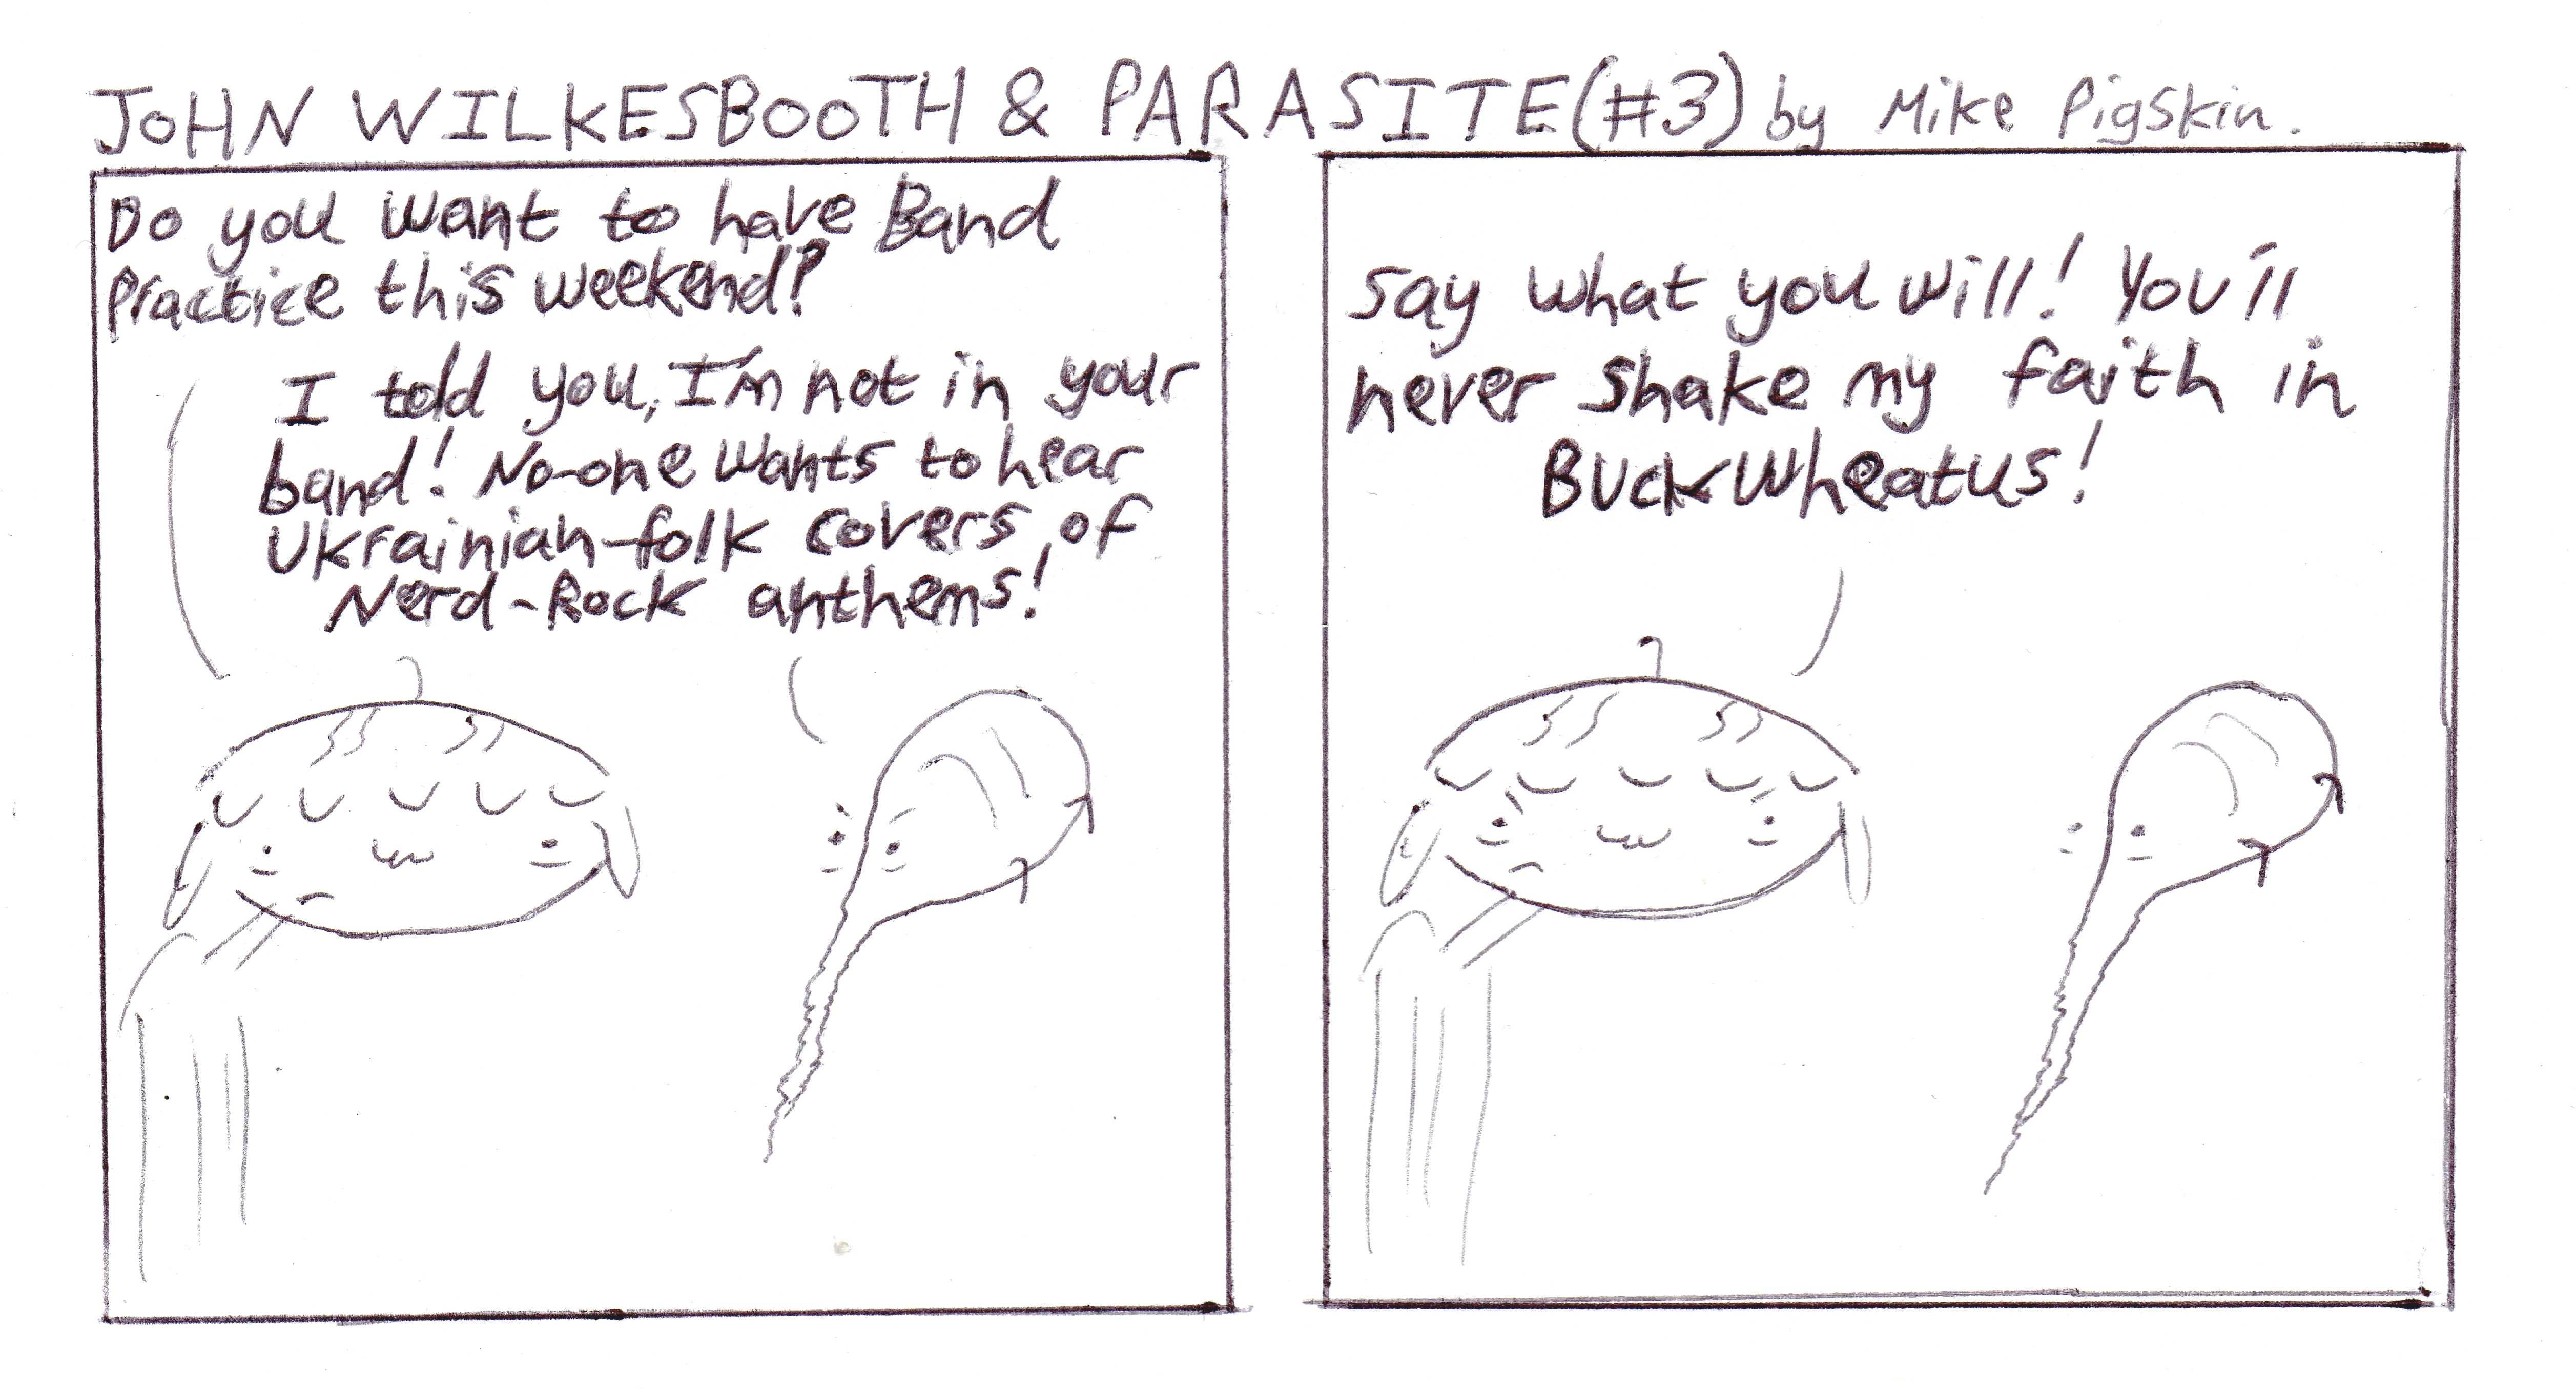 John Wilkesbooth & Parasite #3